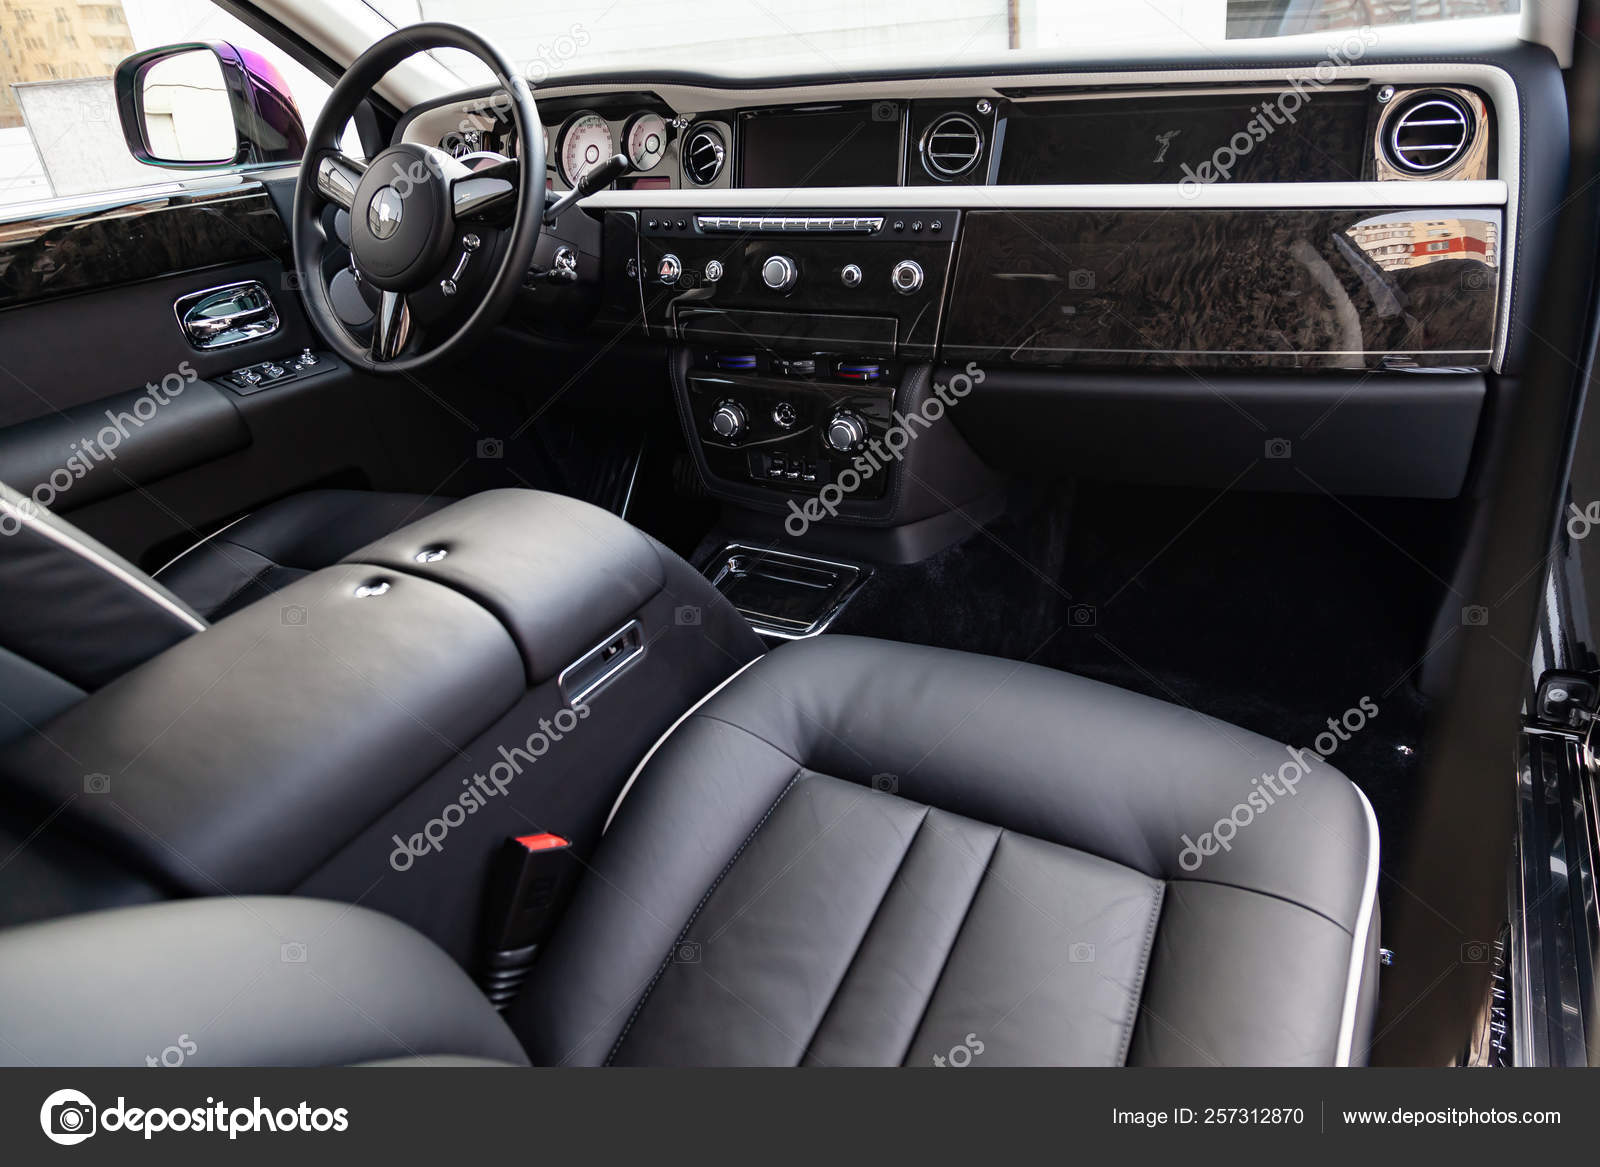 Interior View Of New A Very Expensive Rolls Royce Phantom Car A Stock Editorial Photo C Aleksandrkondratov 257312870